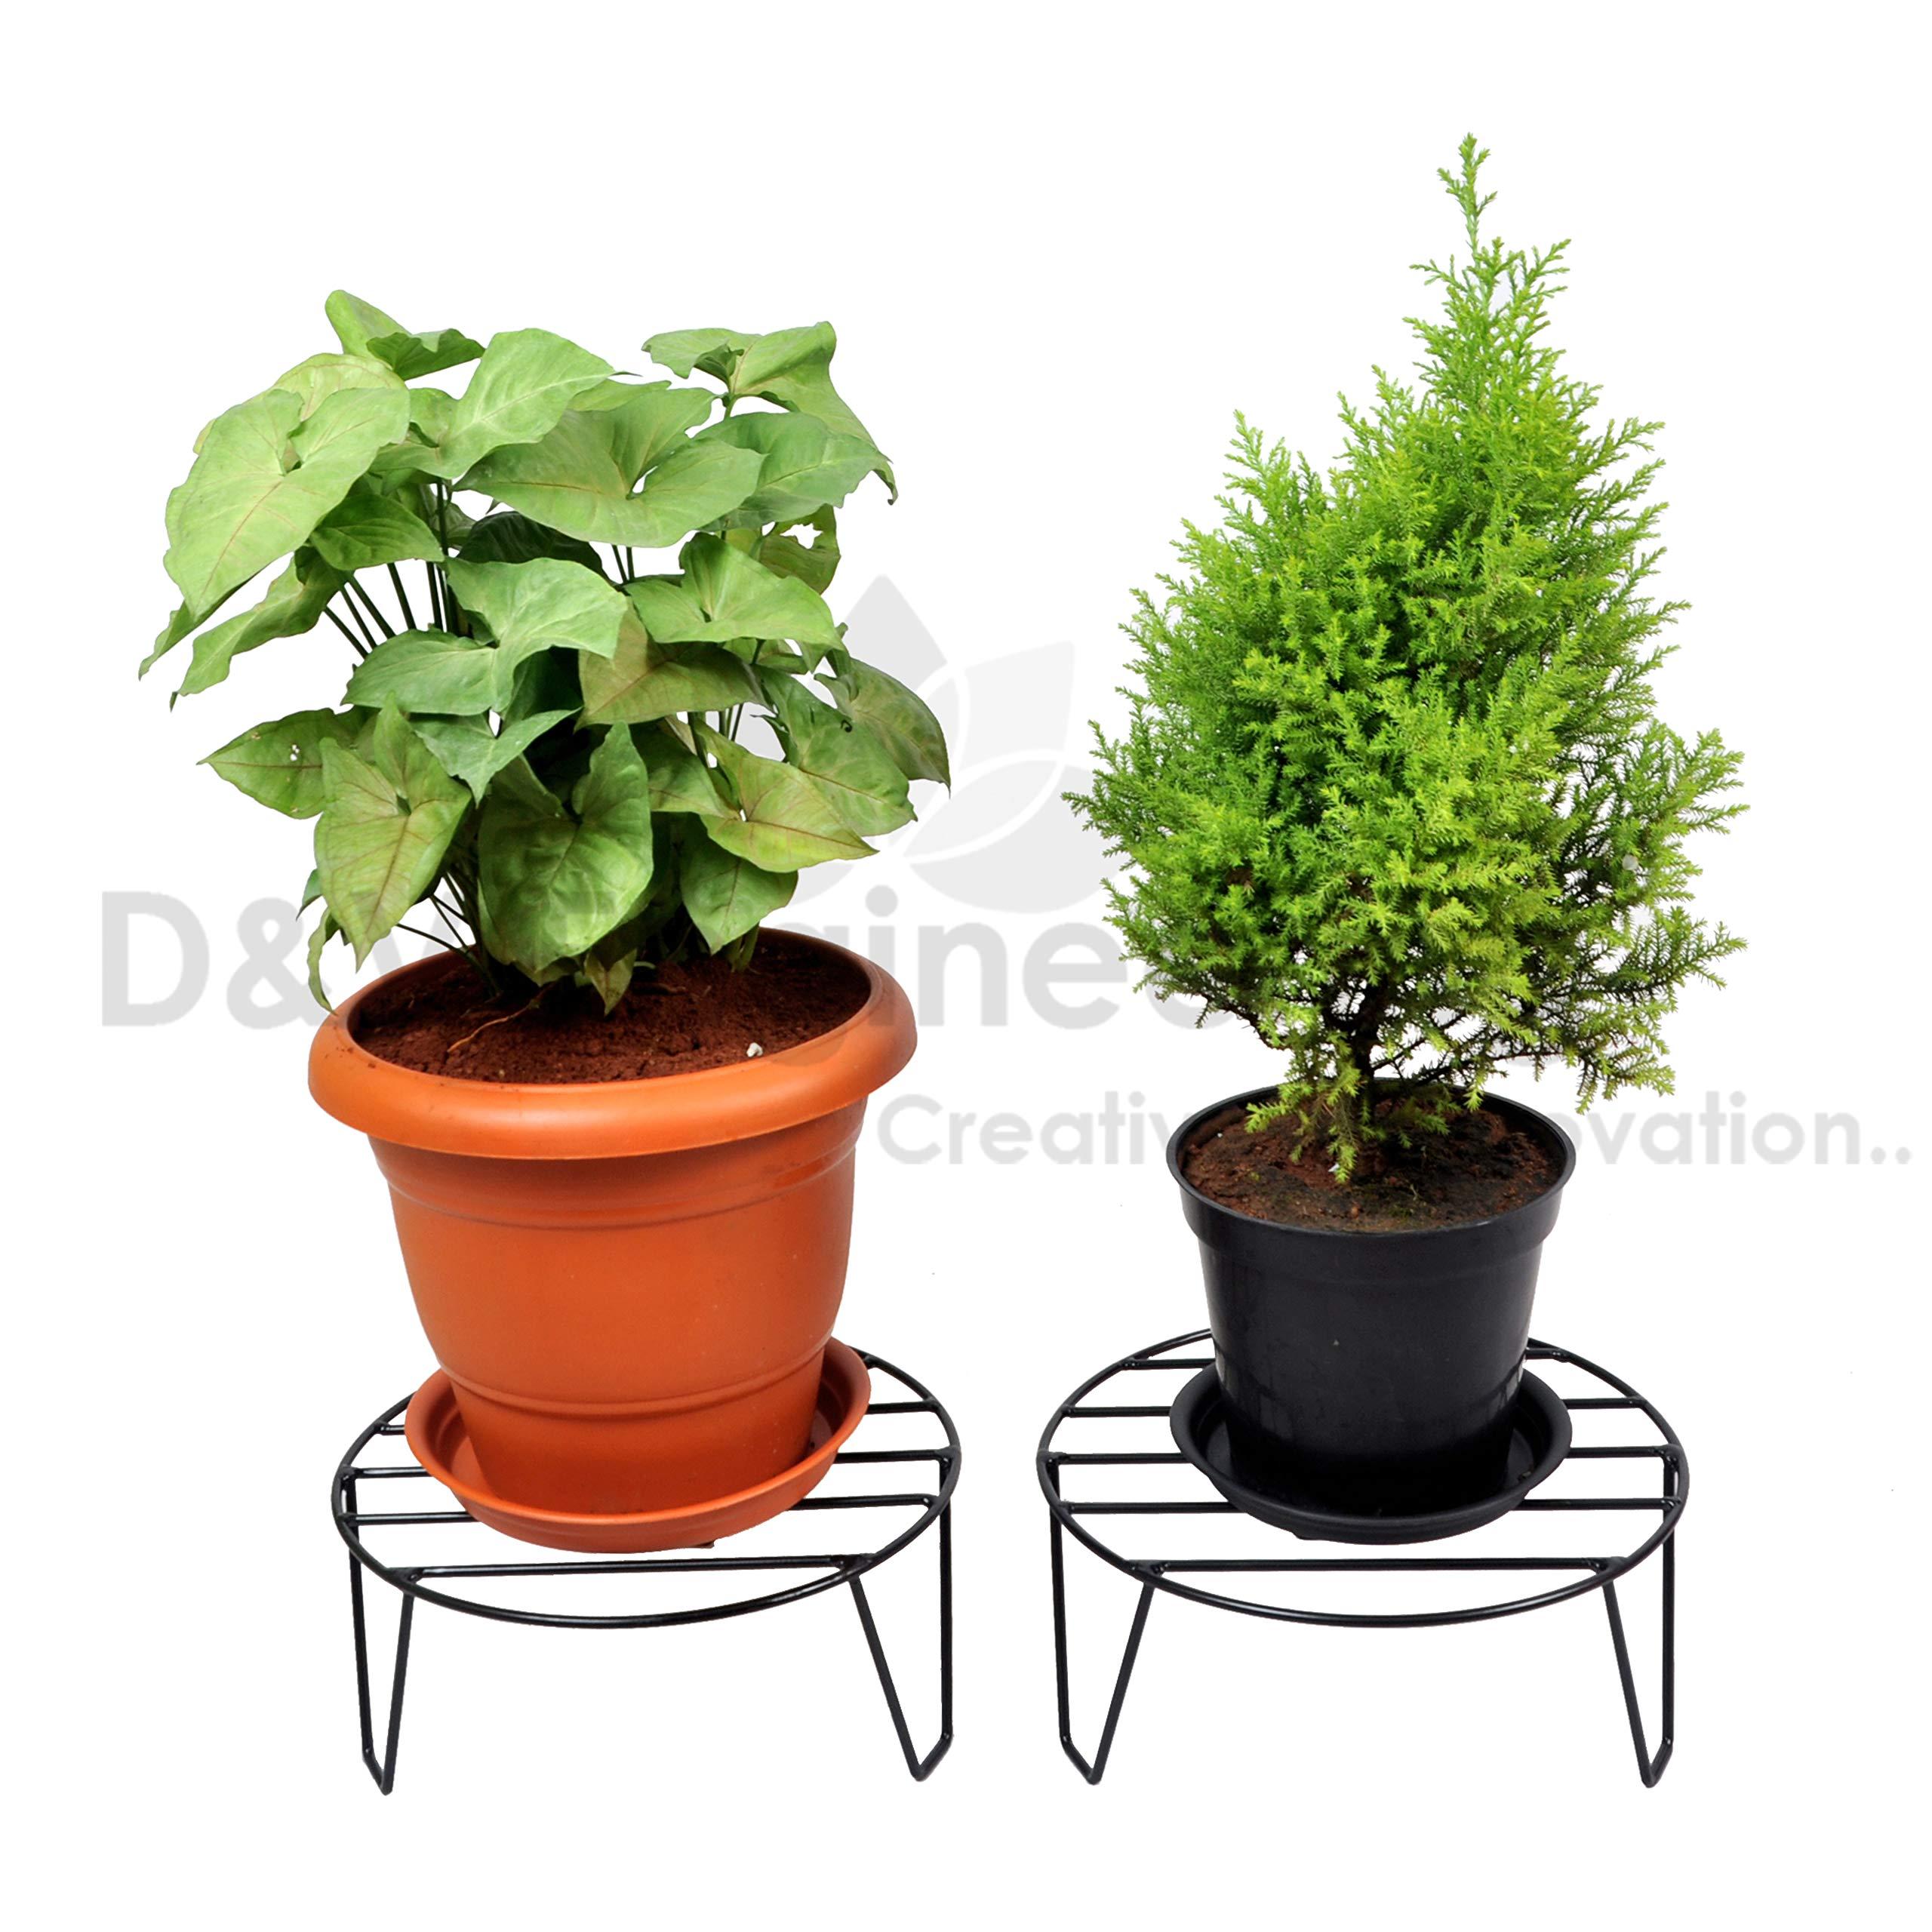 D&V ENGINEERING Round Iron Home Garden Indoor Balcony Decor Floor Flower Plant Stand Pot Rack (11inch, Black) - Set of 2 product image